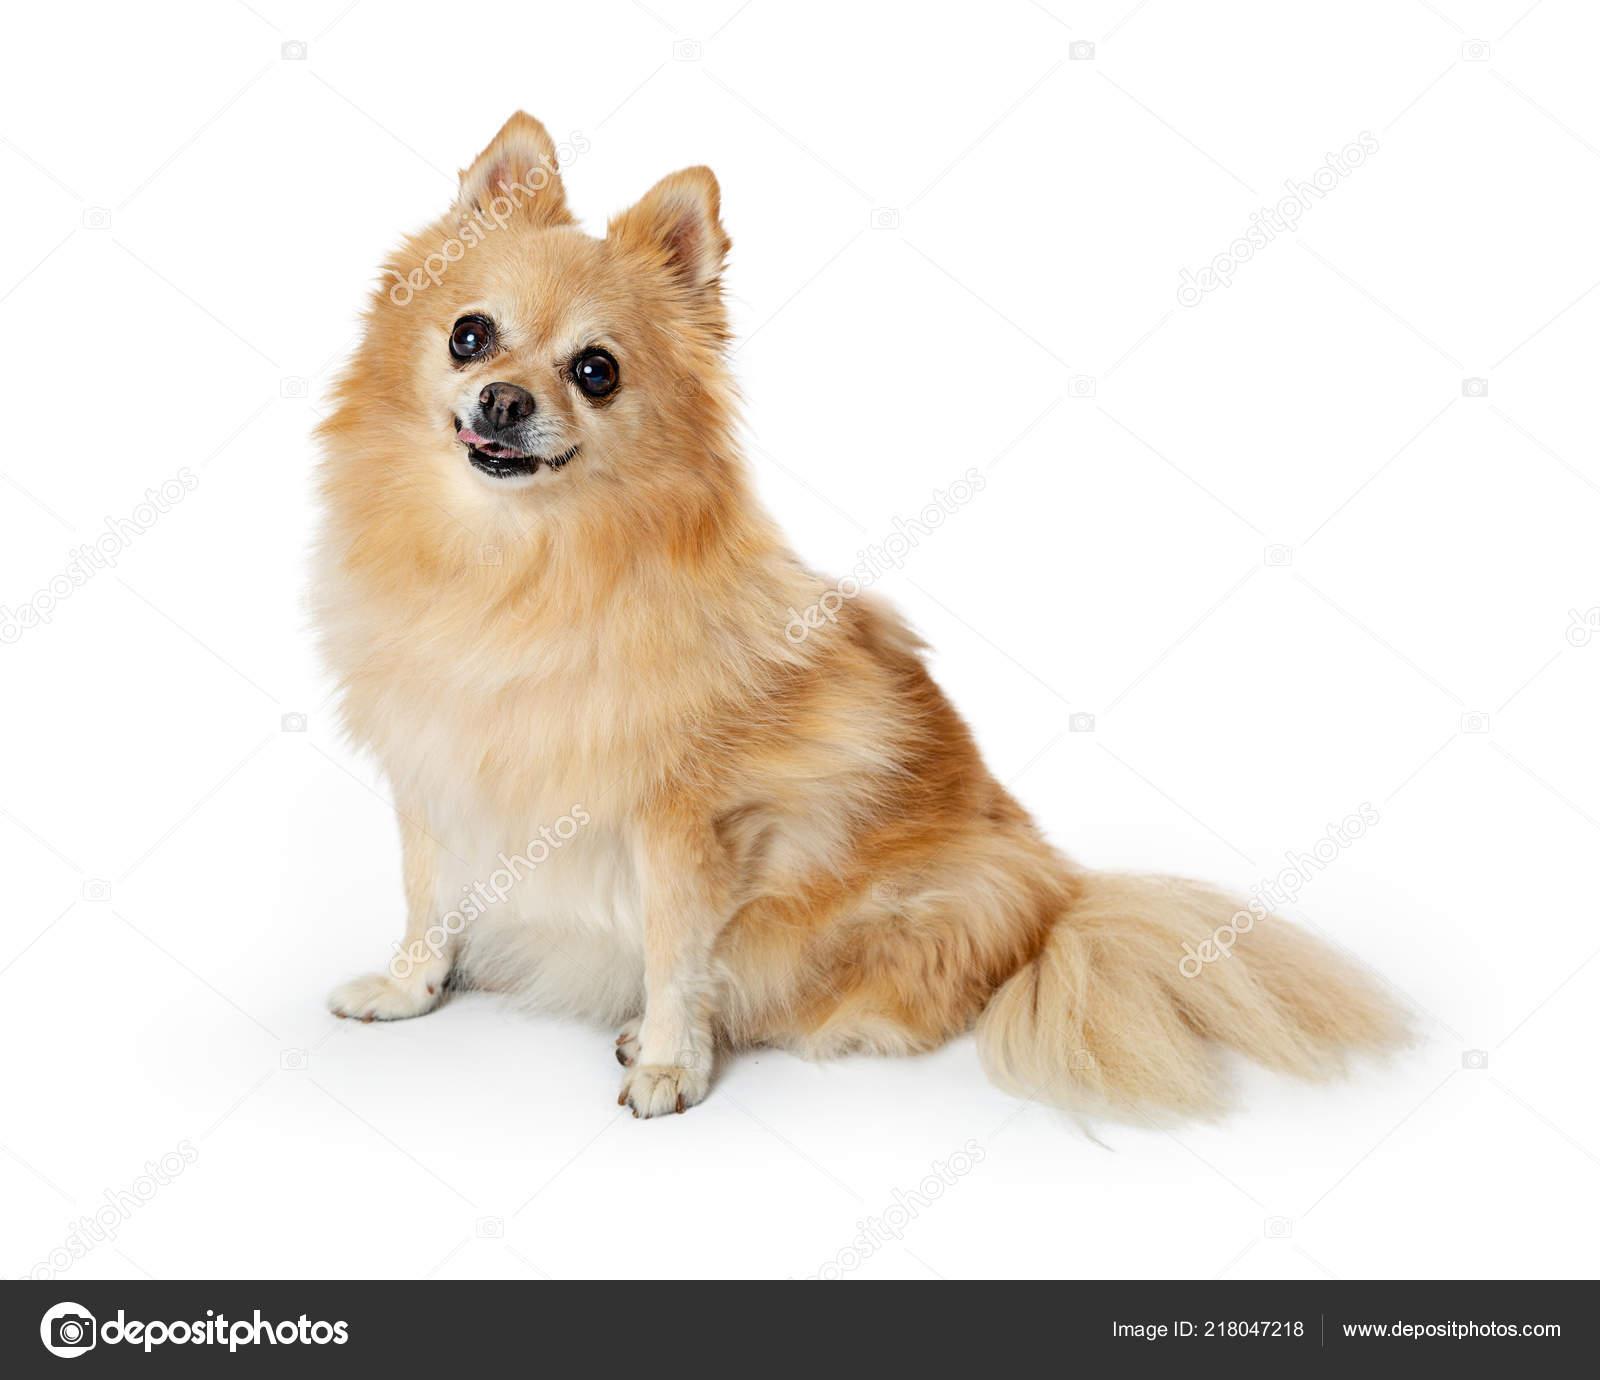 Cute Pomeranian Dog Sitting White Background Looking Camera Happy